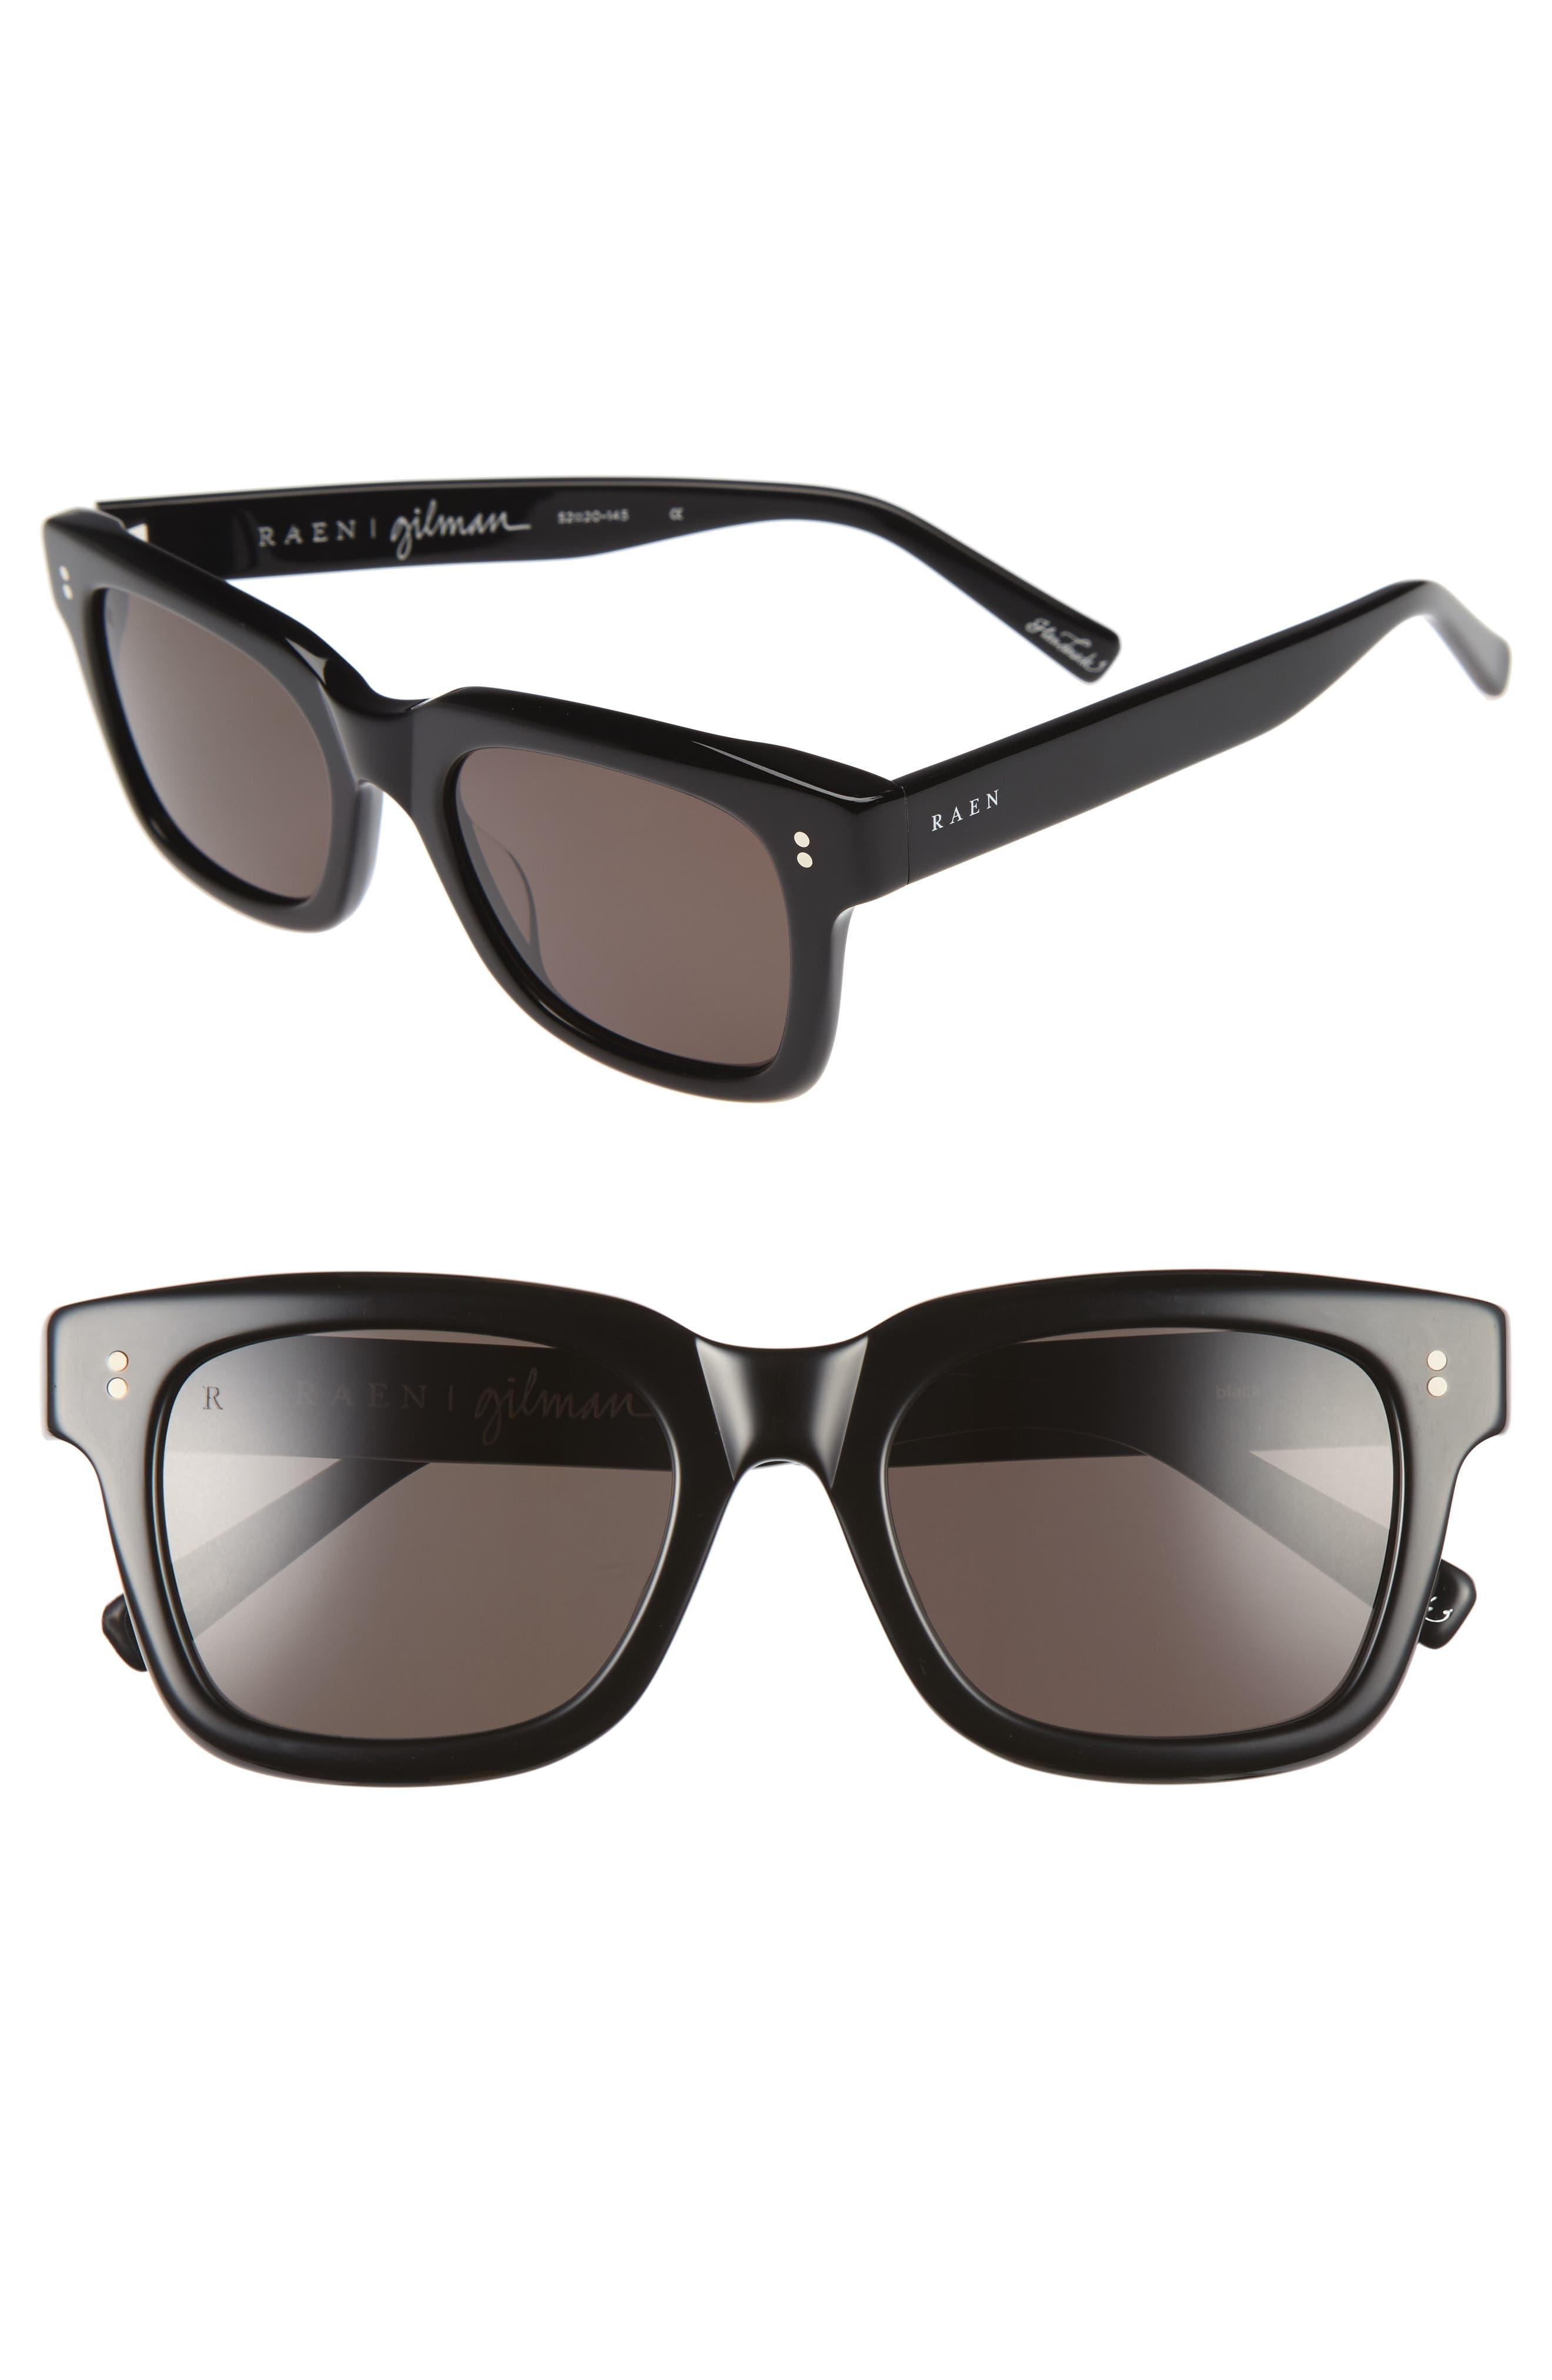 RAEN Gilman 52mm Sunglasses